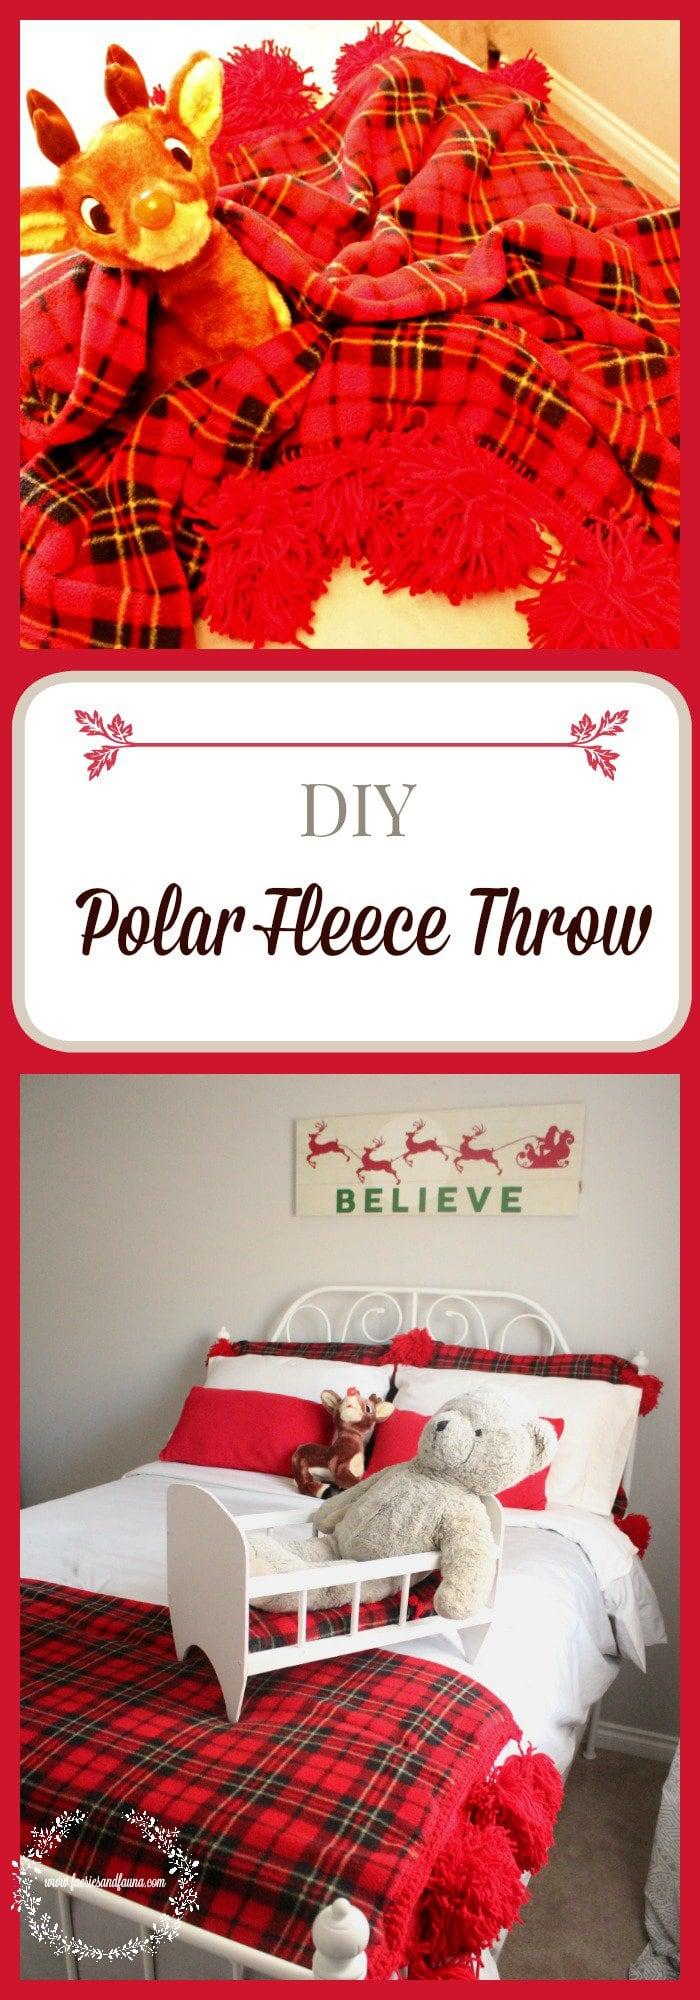 Christmas, DIY, Sewing, Crafts,